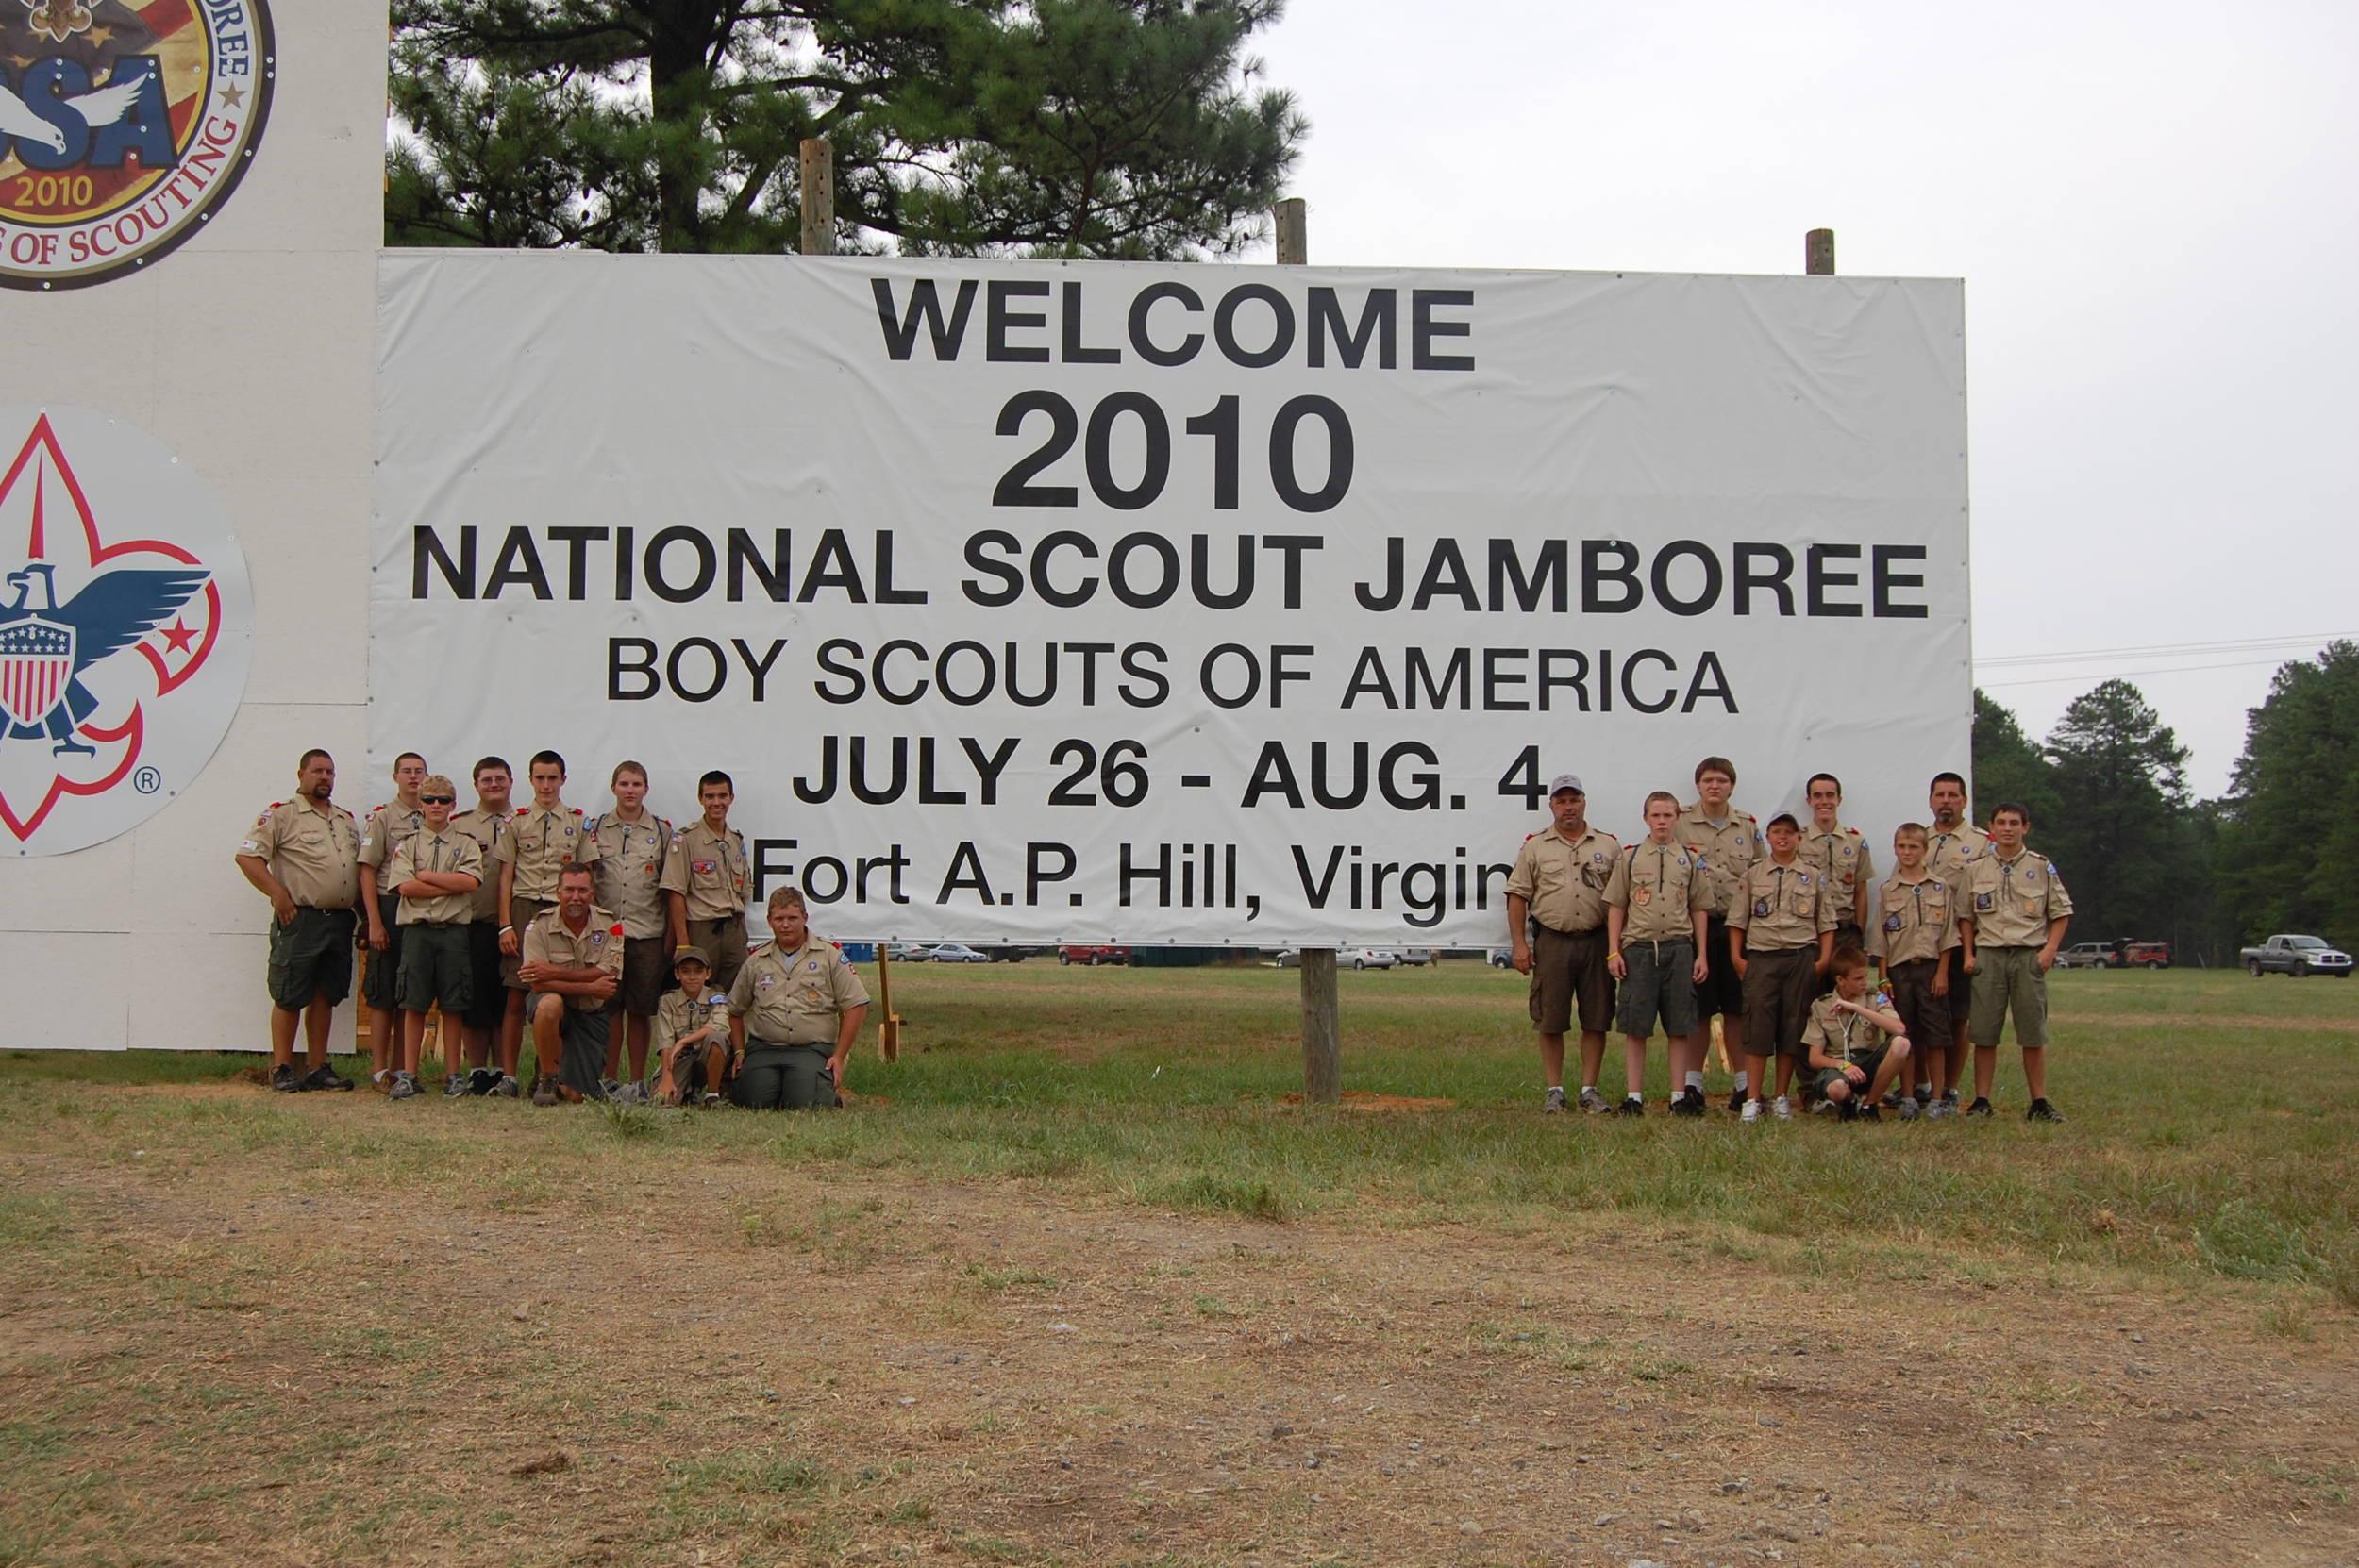 thumb_scouts_639.JPG